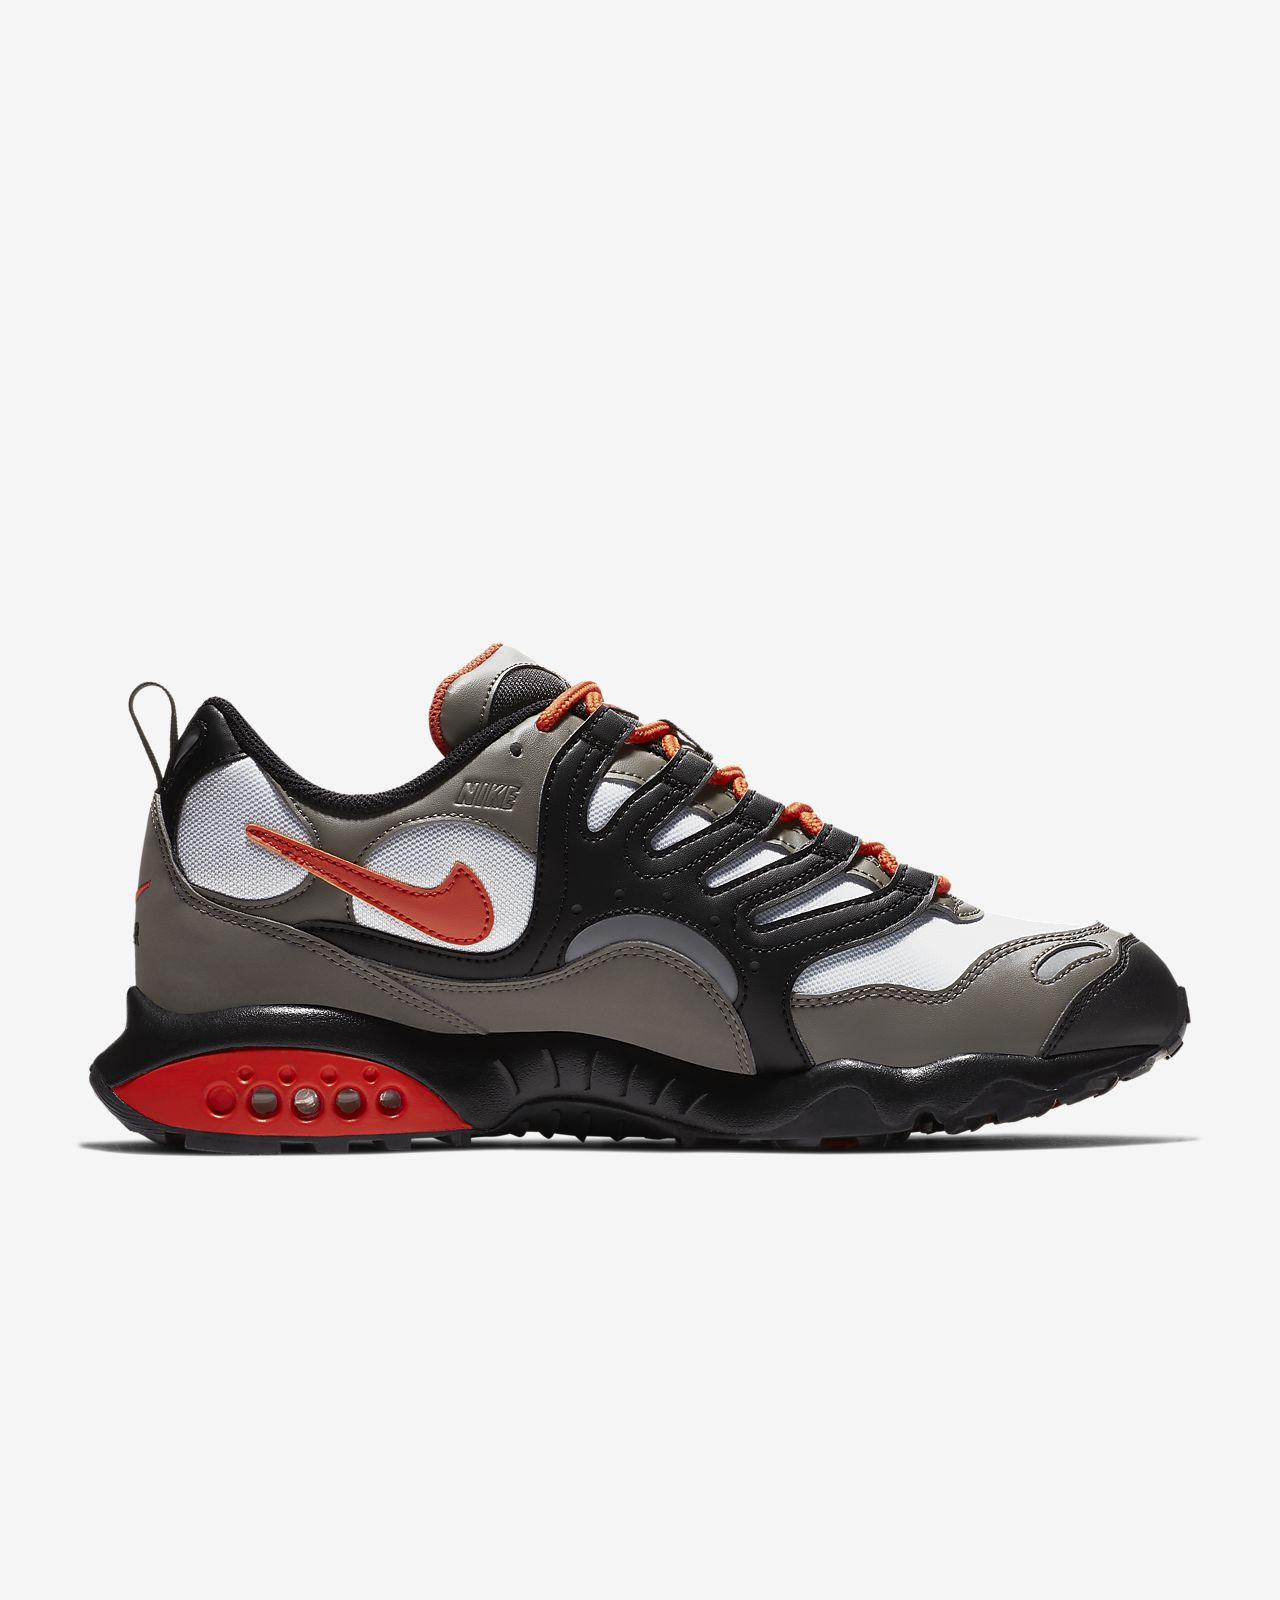 d333eb2b1a9a Nike Air Terra Humara 18 Men s Shoe. Nike.com CA